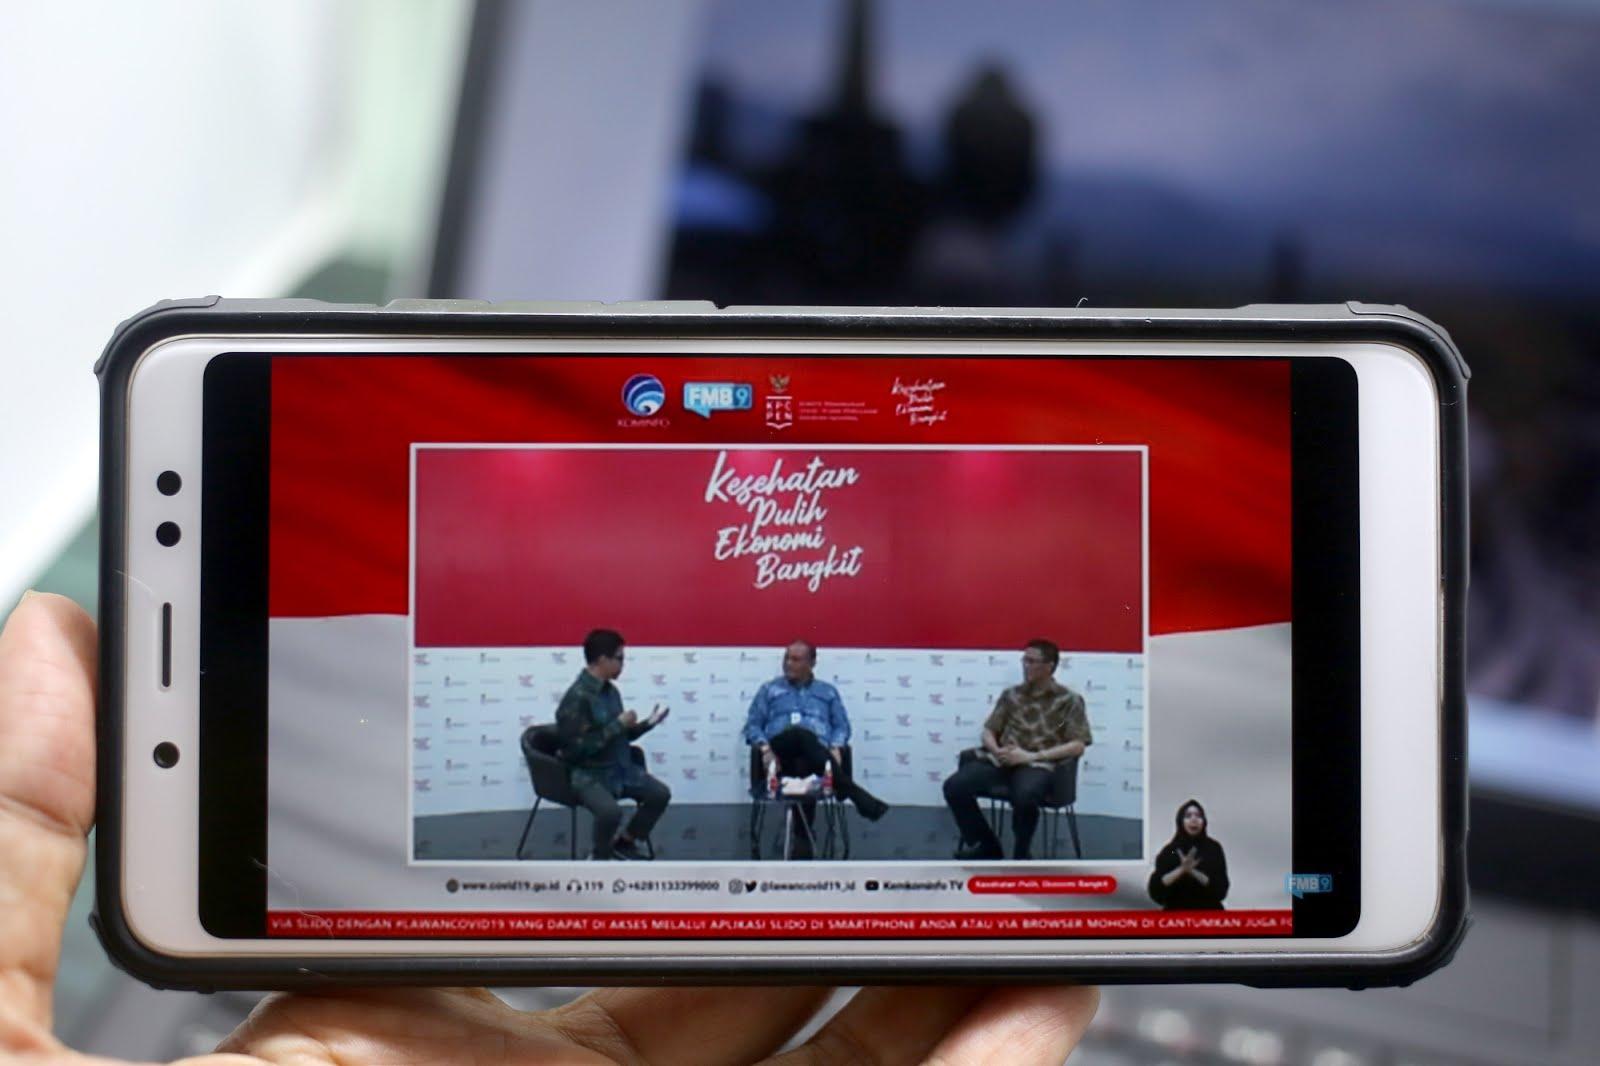 Hibah Pariwisata Untuk Dukung Industri Pariwisata Indonesia